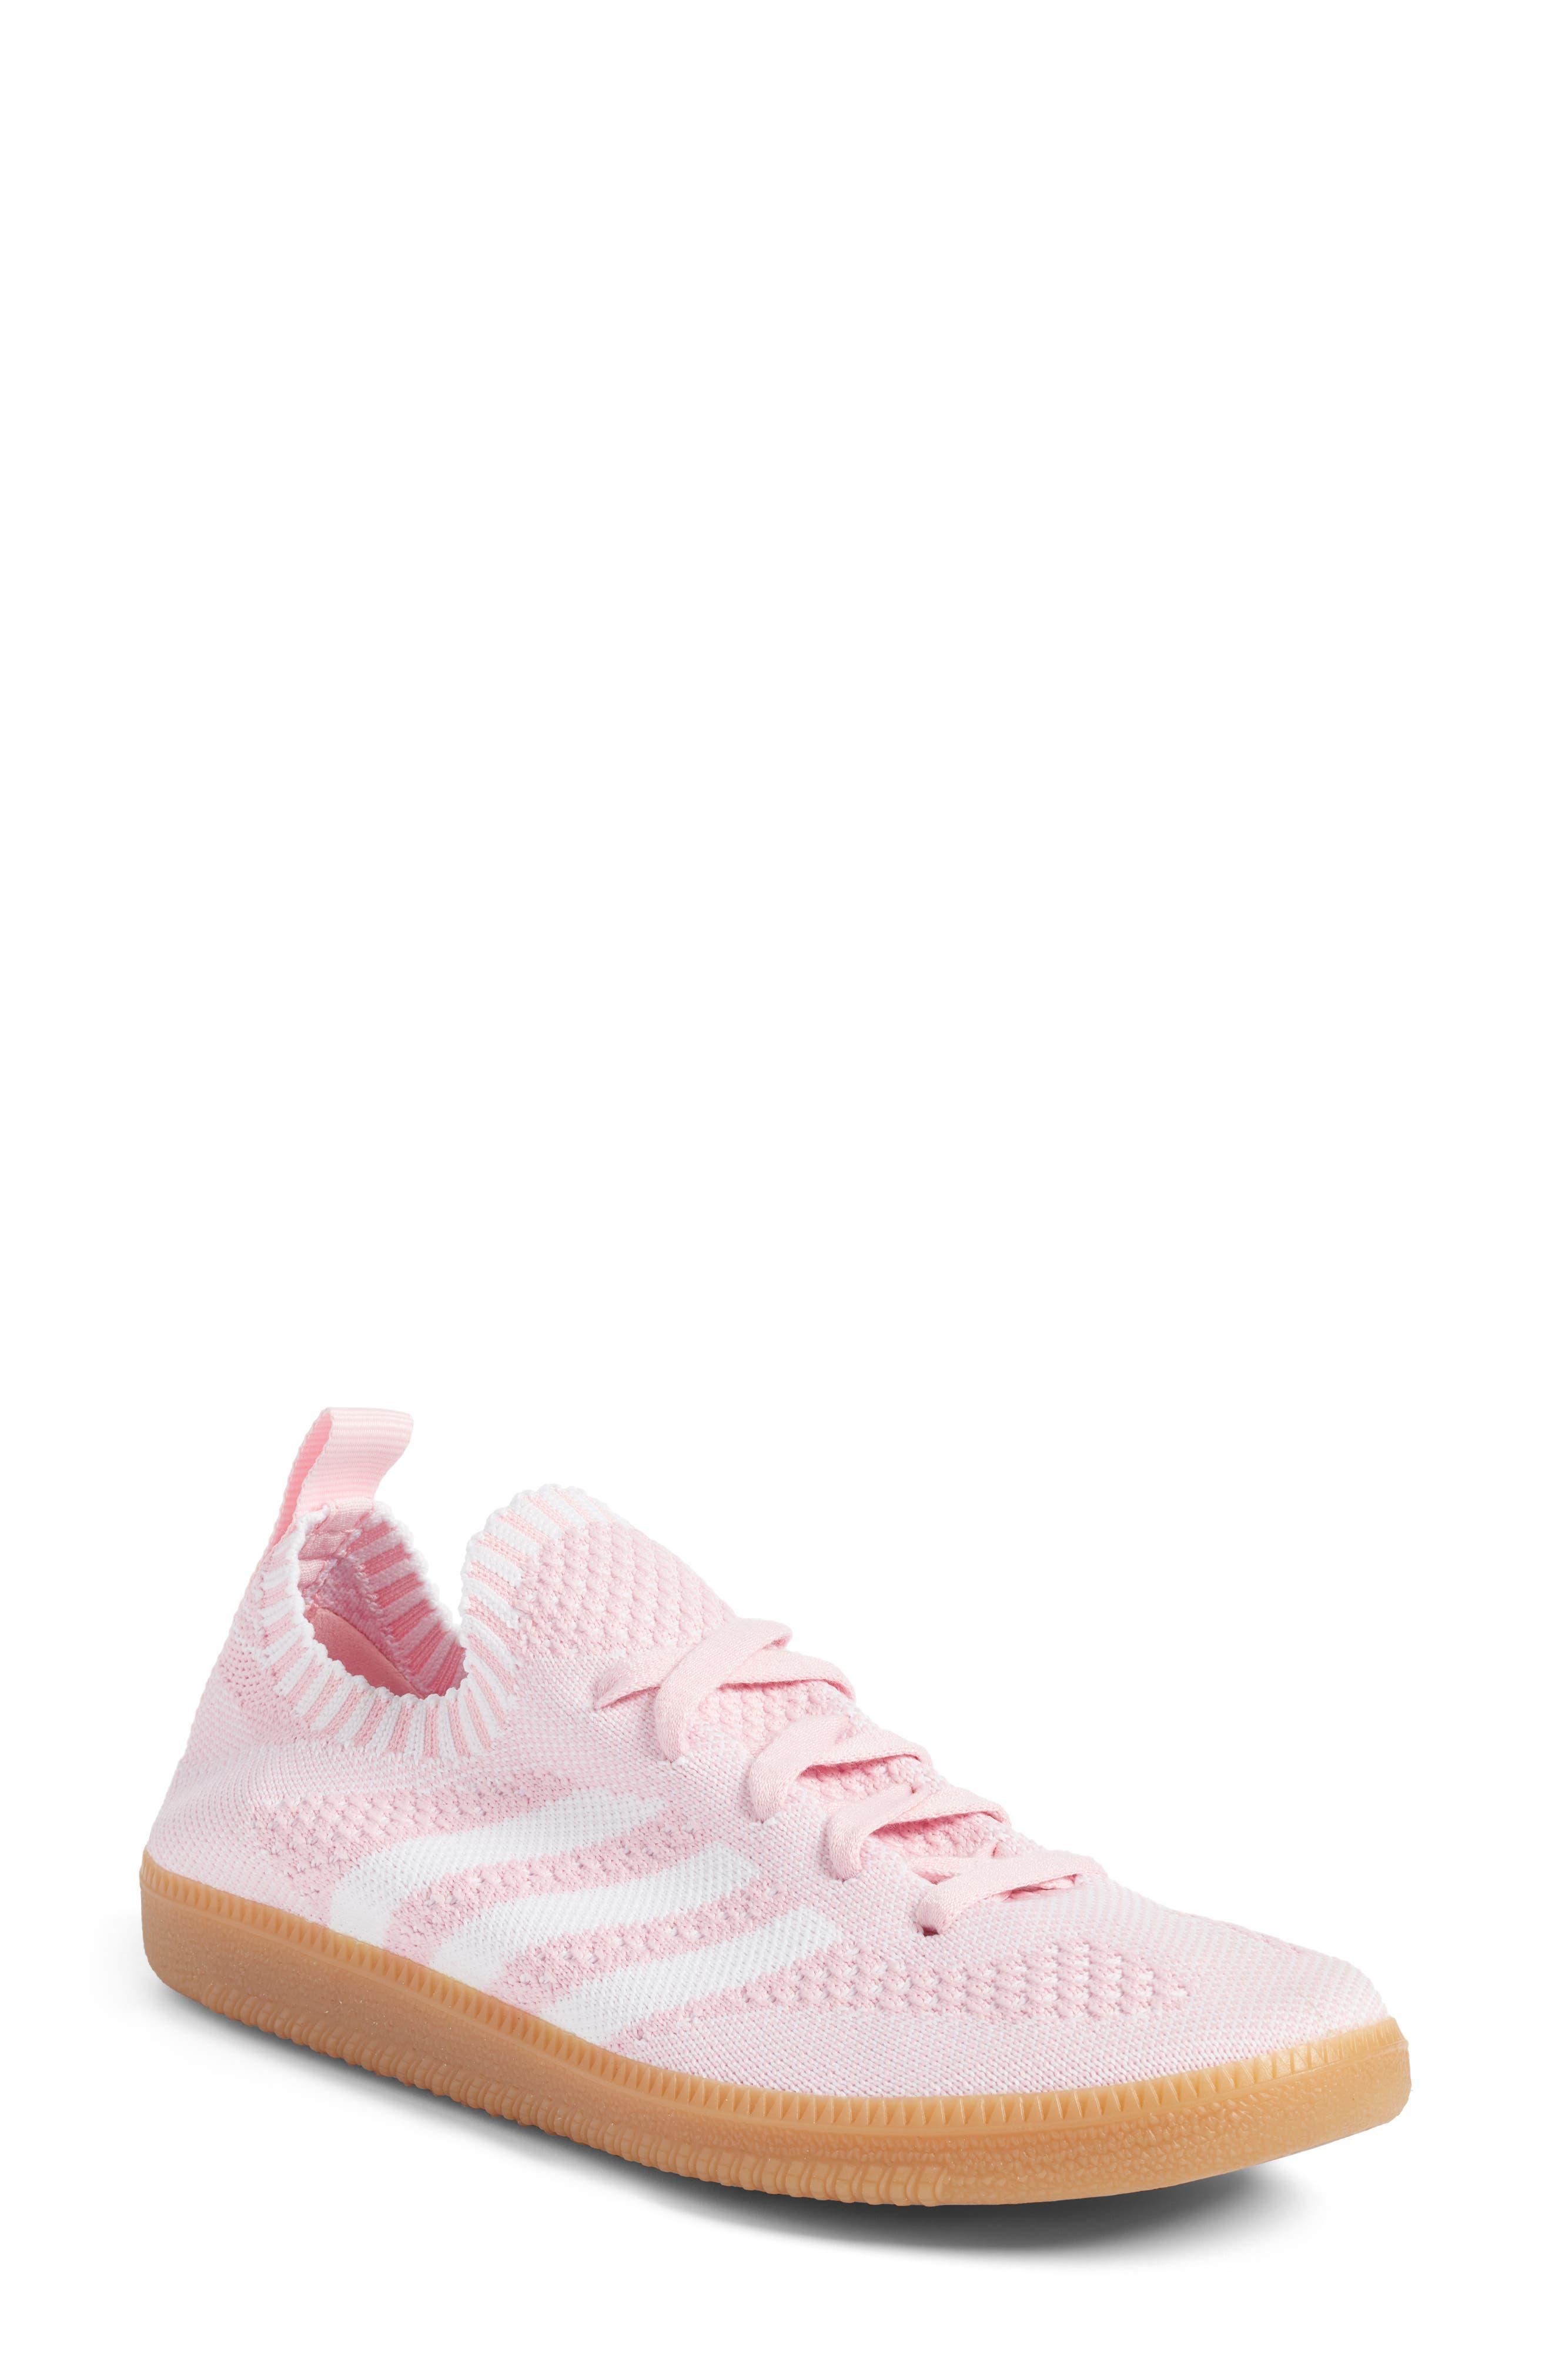 Adidas Originals Samba Primeknit Sneaker In Wonder Pink  White  Gum 1d039cb85